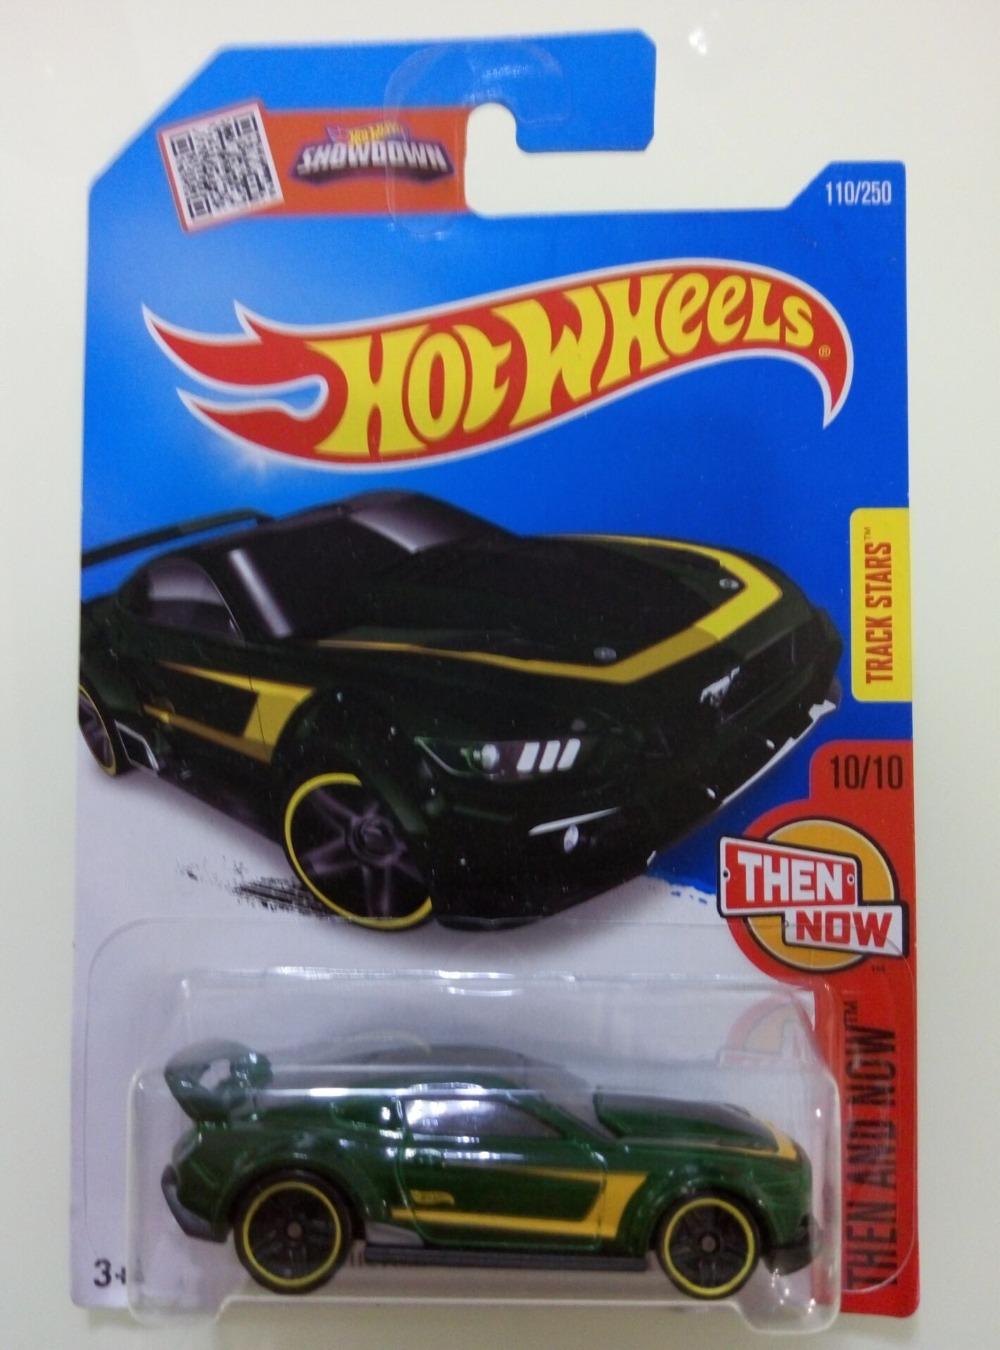 CUSTOM 15 FORD MUSTANG G,Hot wheels 1:64 alloy car model,kid's car toys,Concept cars(China (Mainland))